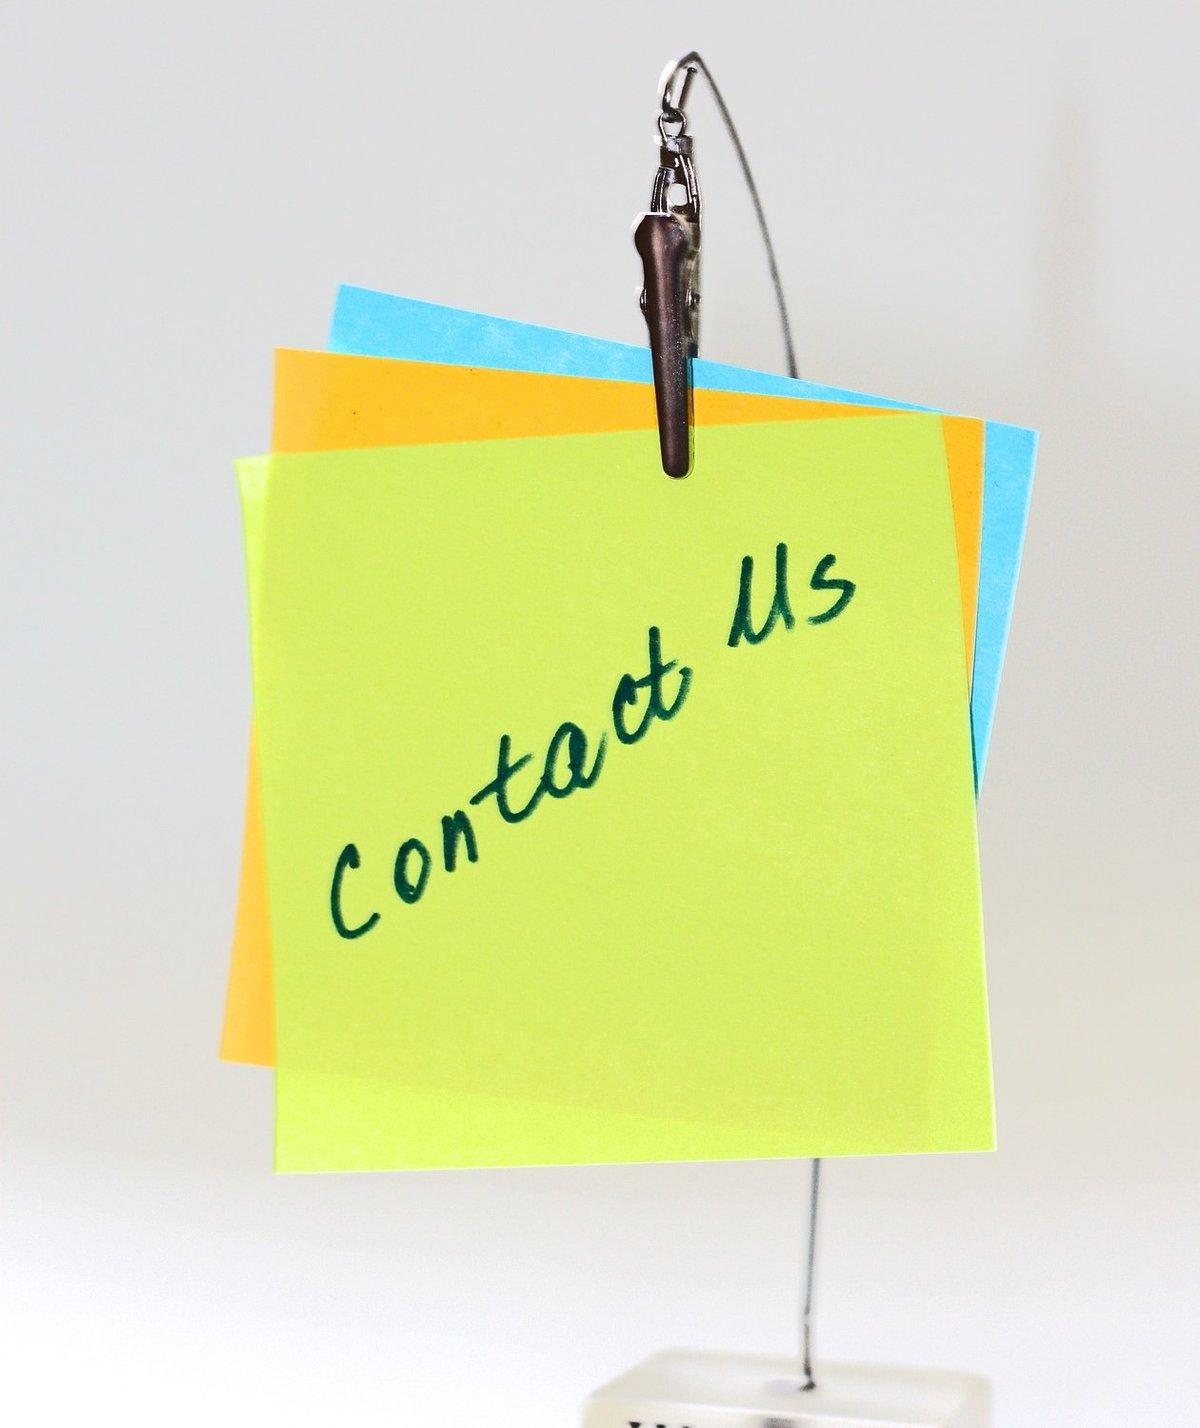 contact-us-2393716_1920 (2).jpg